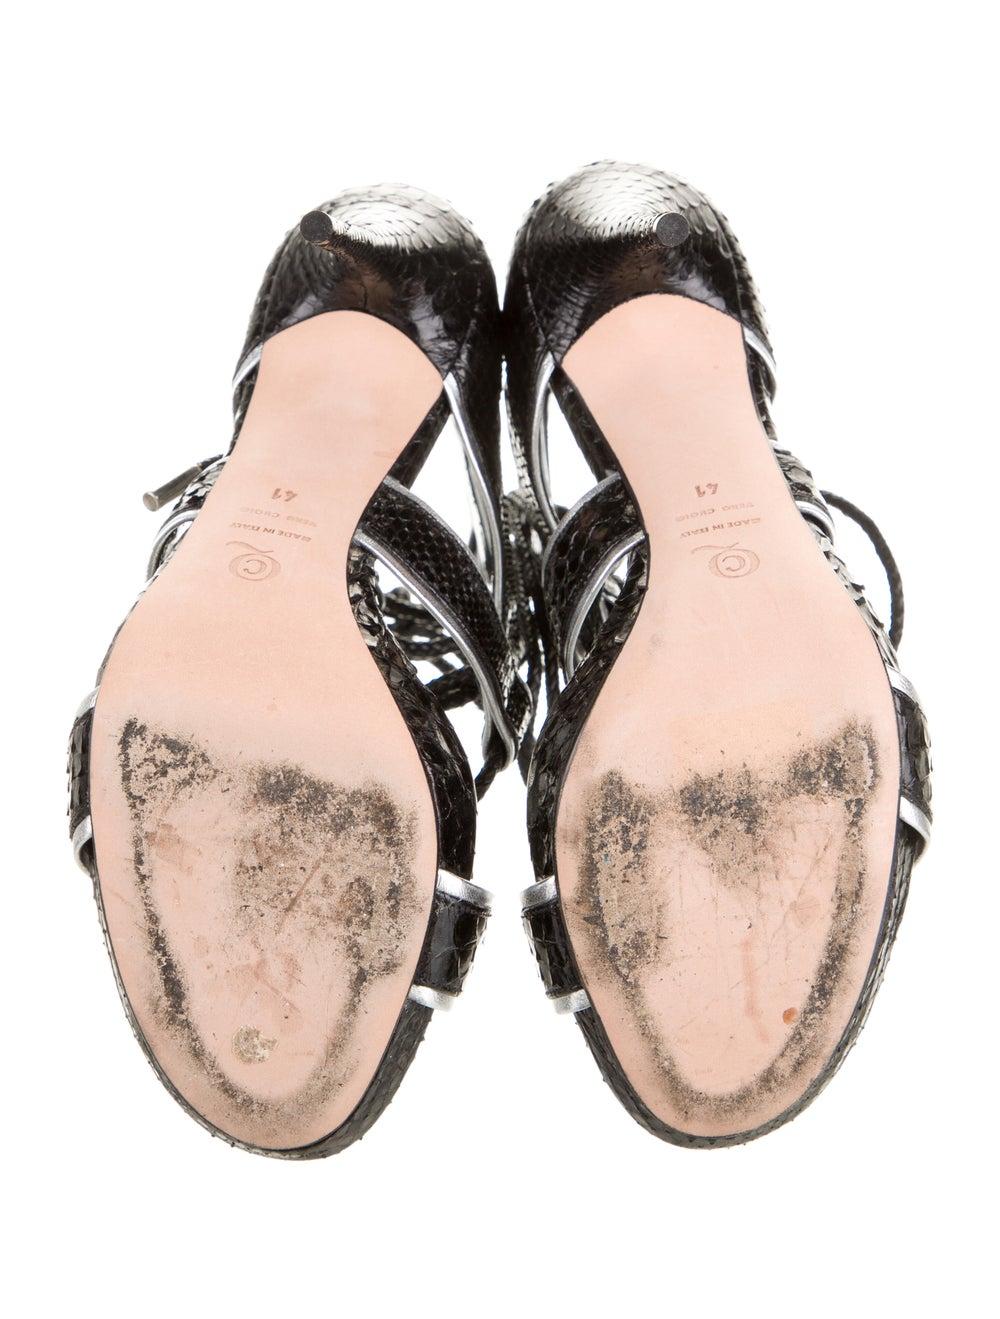 Alexander McQueen Snakeskin Platform Sandals Black - image 5